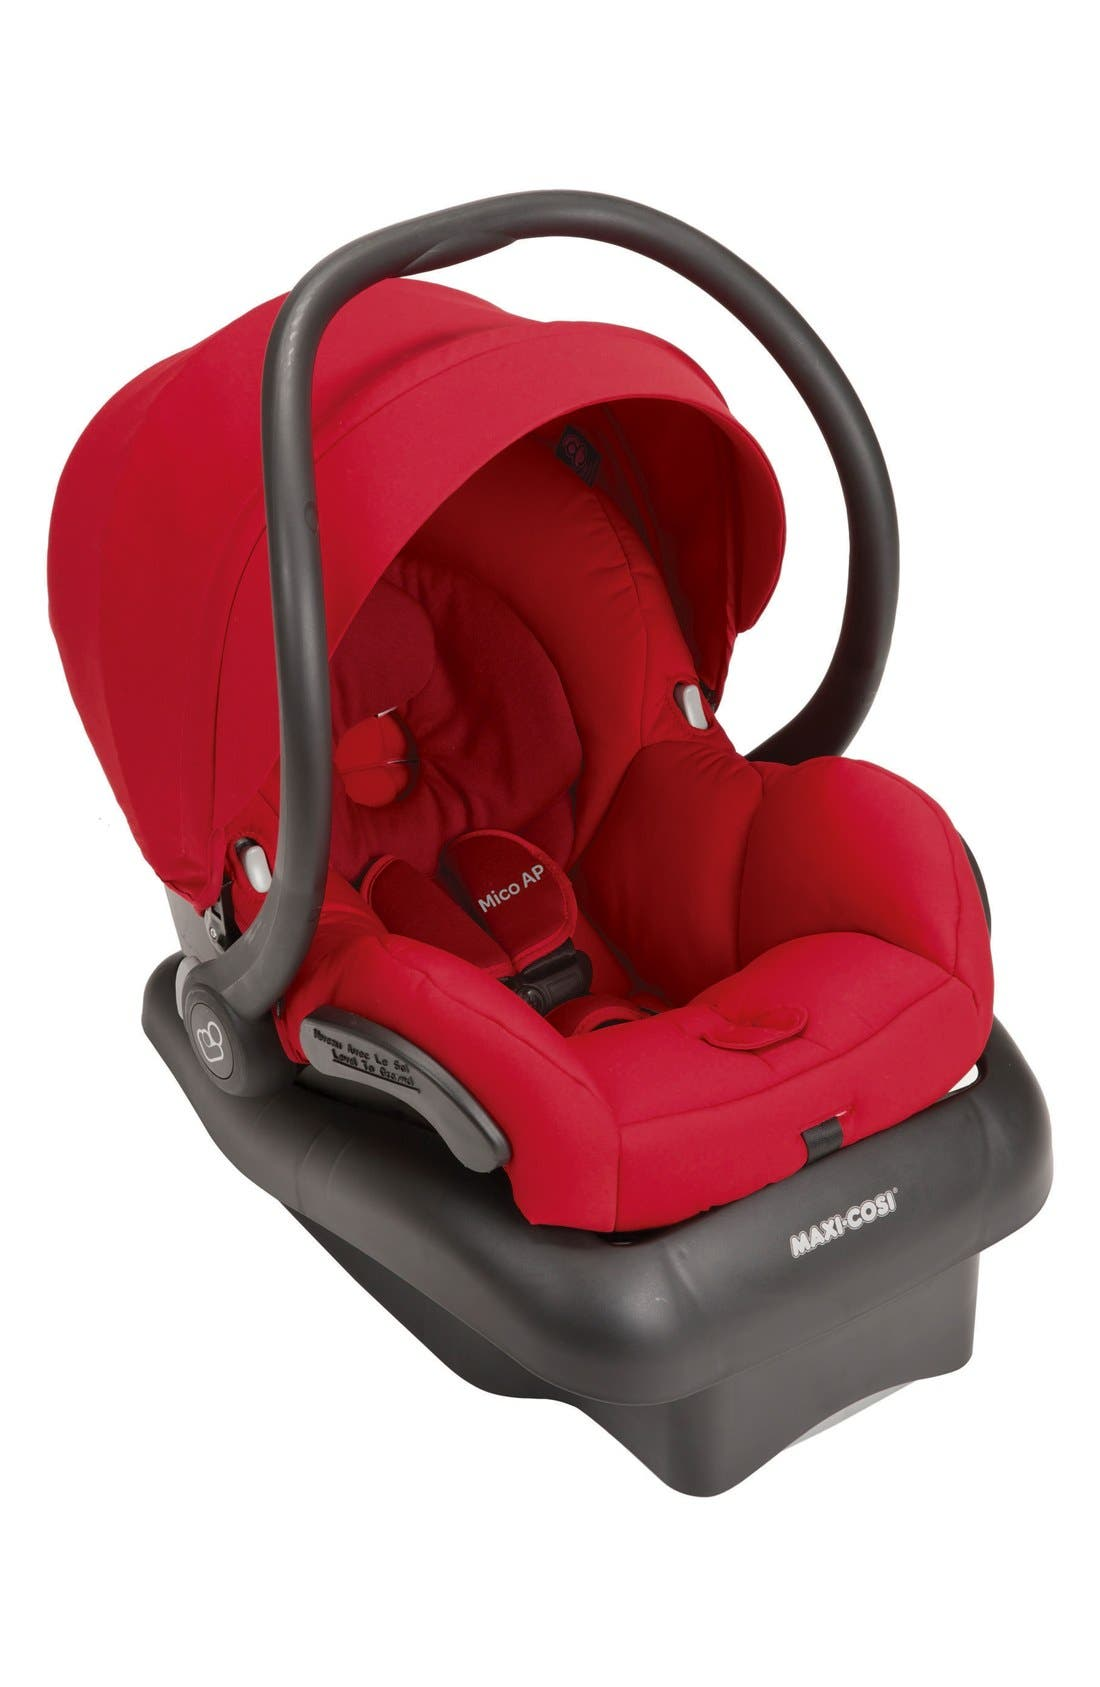 Maxi-Cosi® 'Mico AP' Infant Car Seat